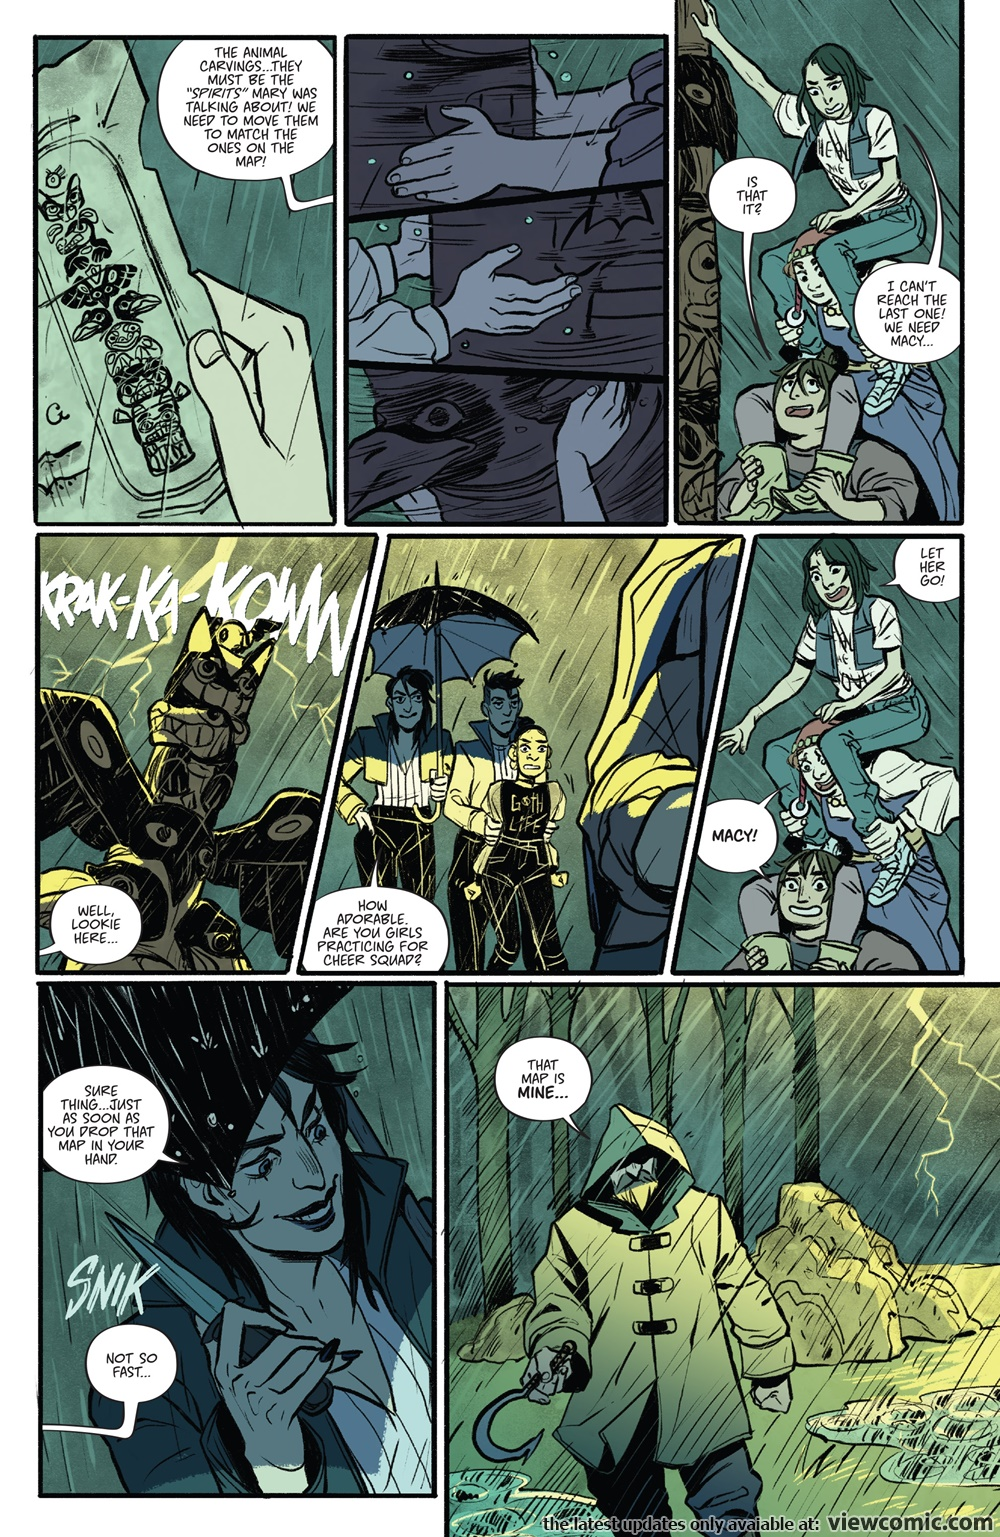 Misfit City 004 (2017)  | Vietcomic.net reading comics online for free